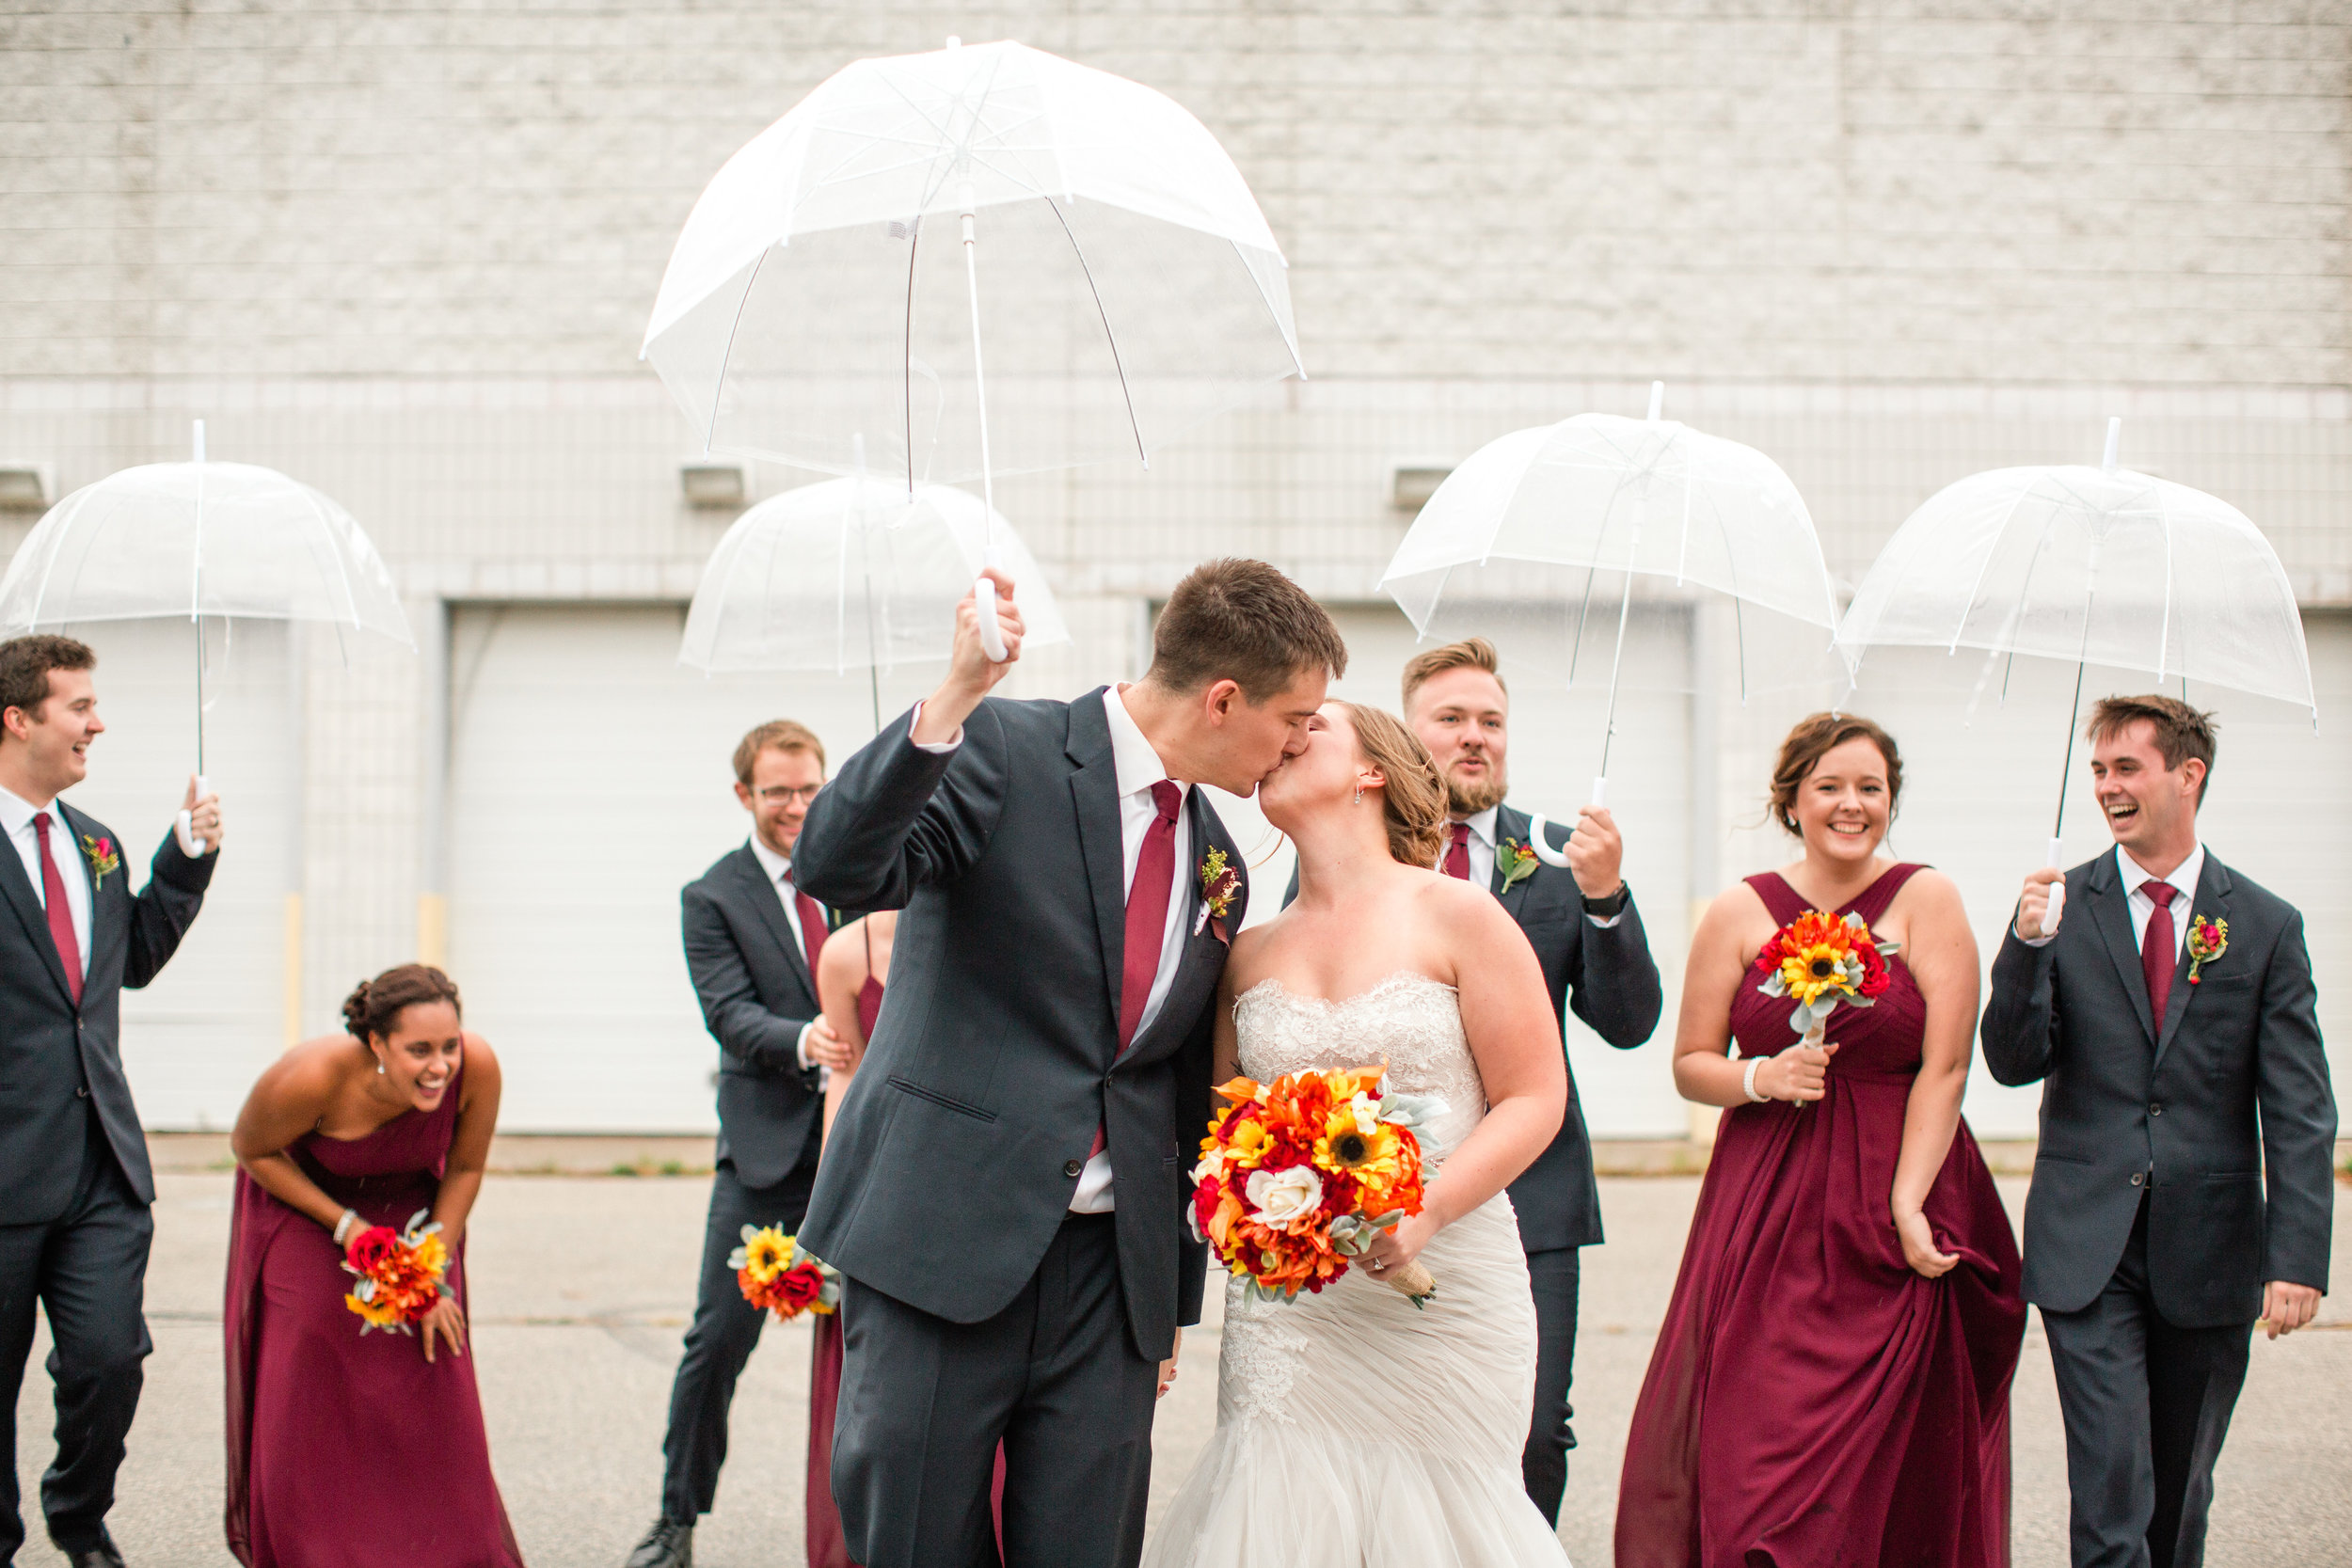 rainy day wedding with clear umbrellas bride groom kissing